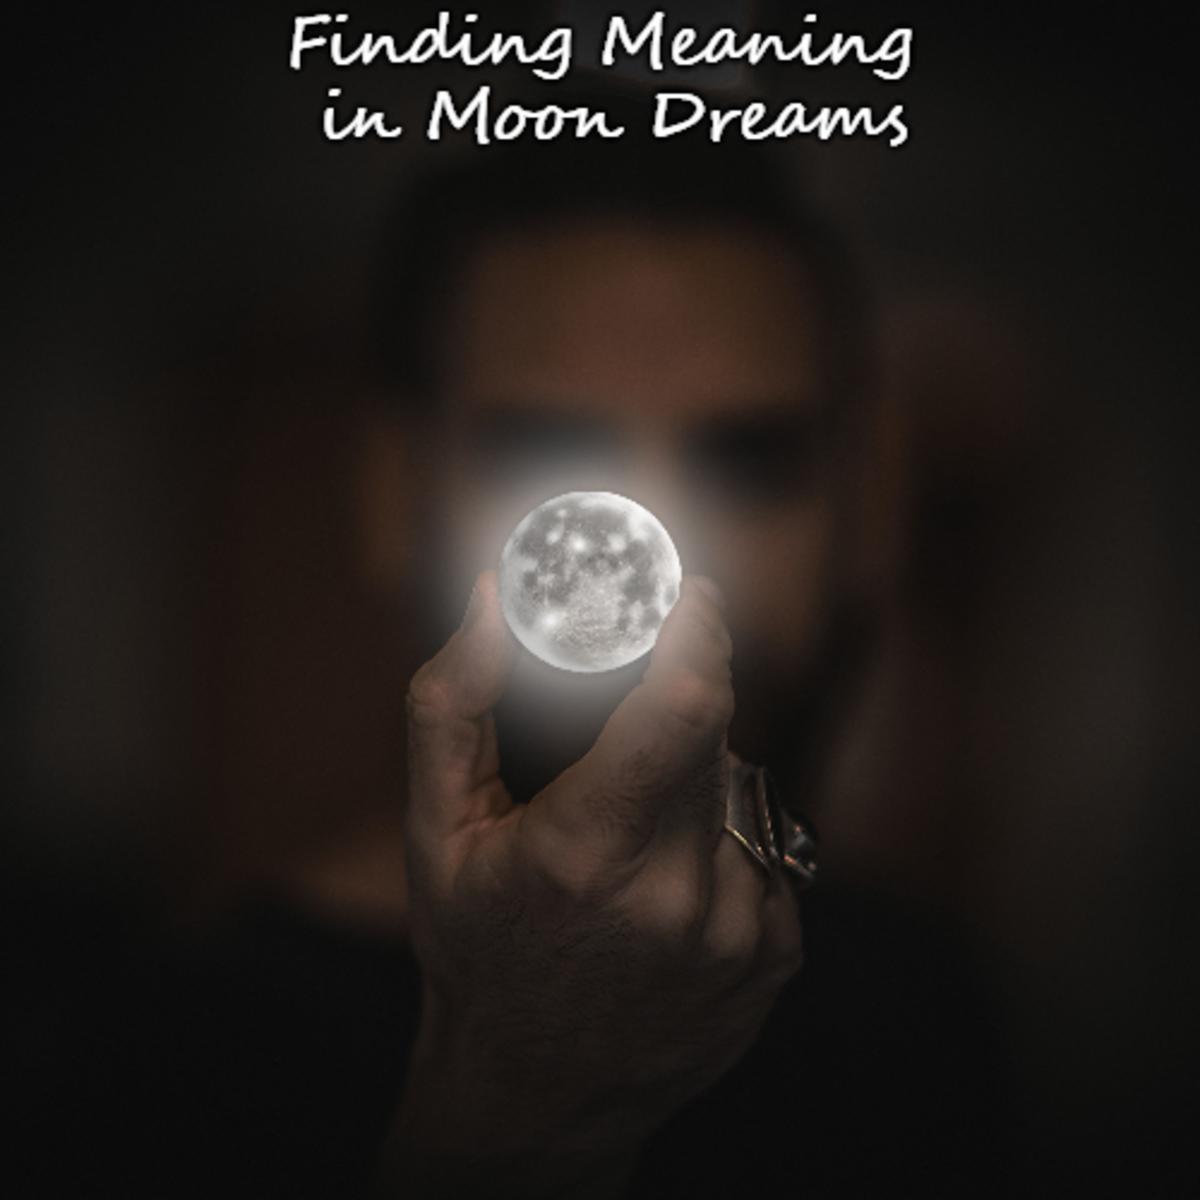 how-to-interpret-the-moon-as-a-dream-symbol